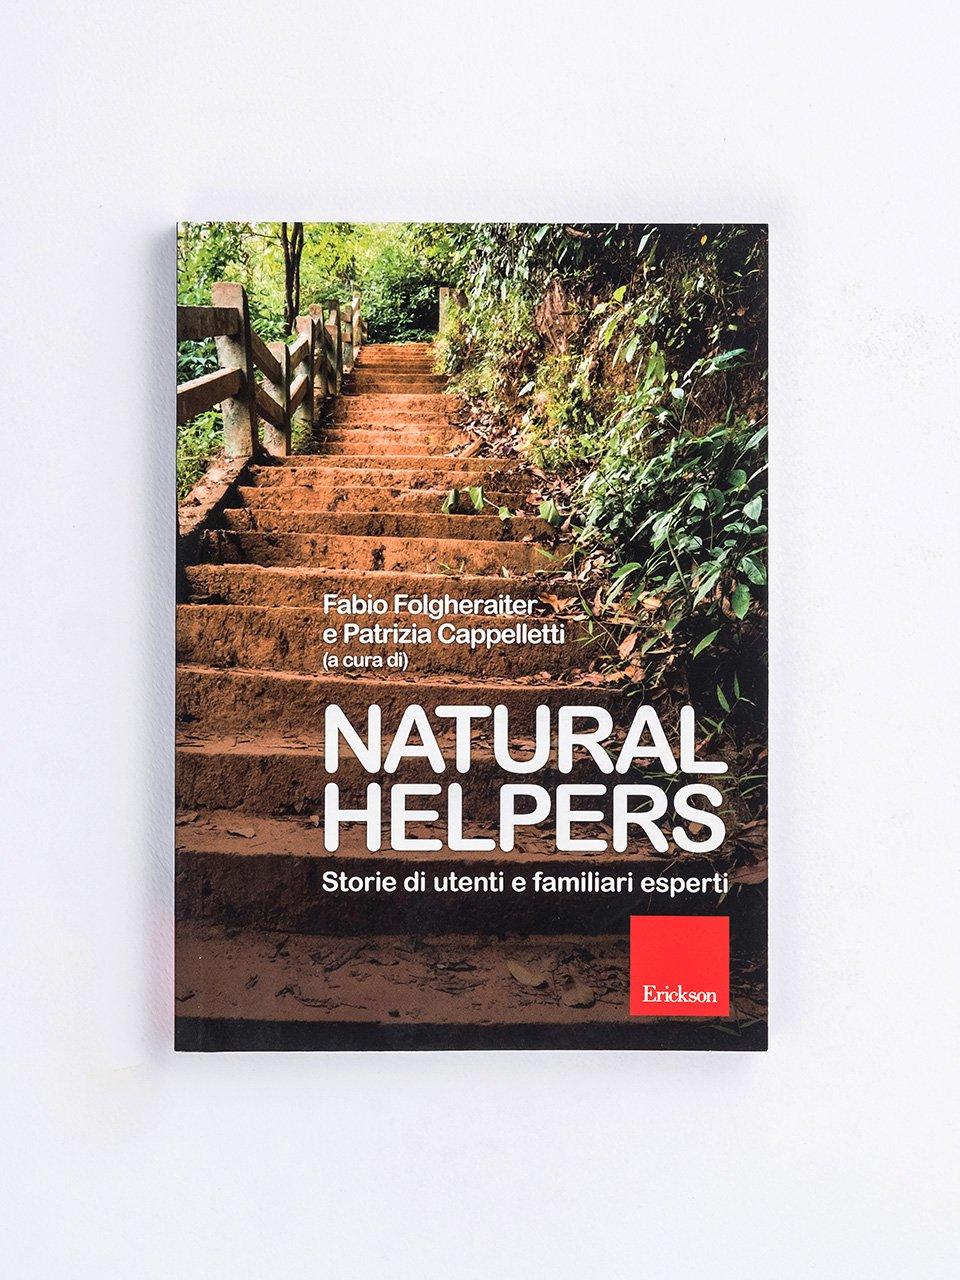 Natural Helpers - L'evoluzione dei sistemi di welfare - Erickson